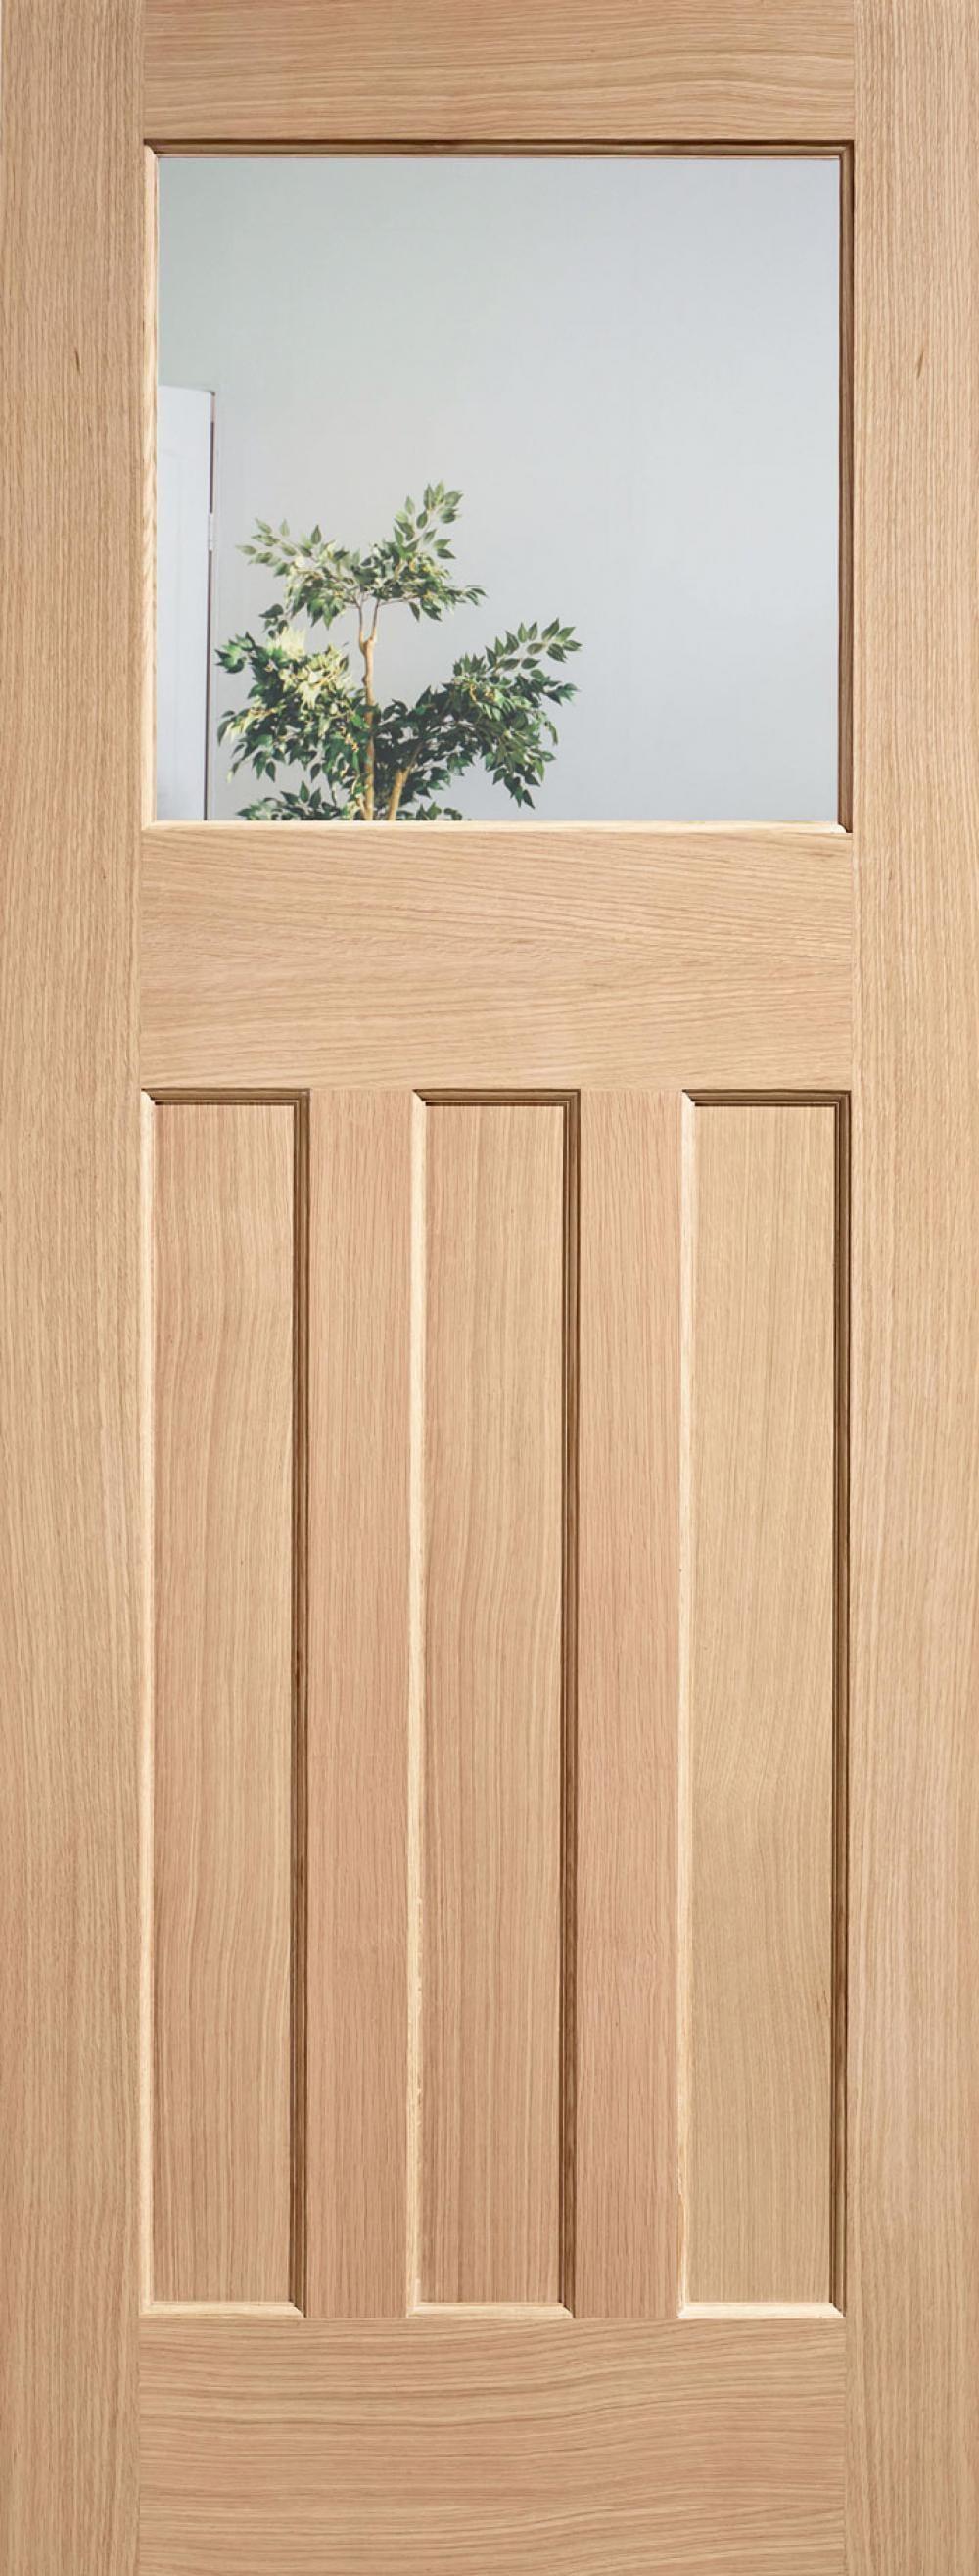 Dx 30s Style Oak Door - Clear Glass Image